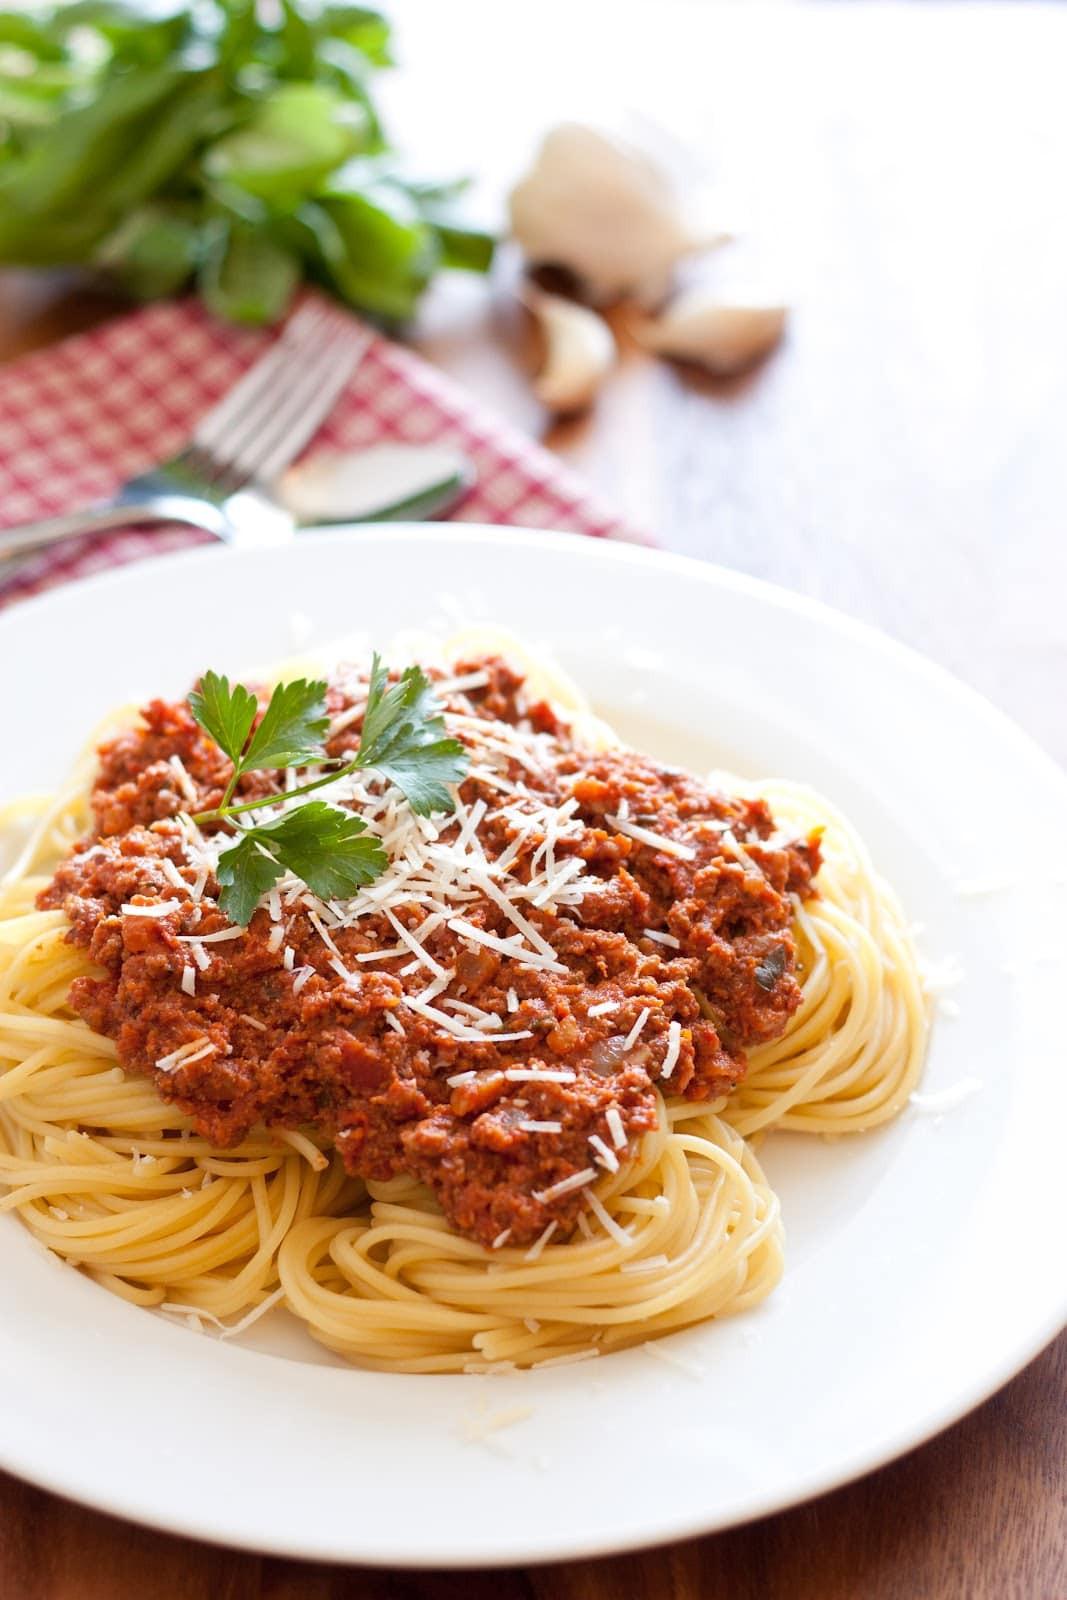 Italian Spaghetti Sauce  Spaghetti with Meat Sauce Authentic Italian Style